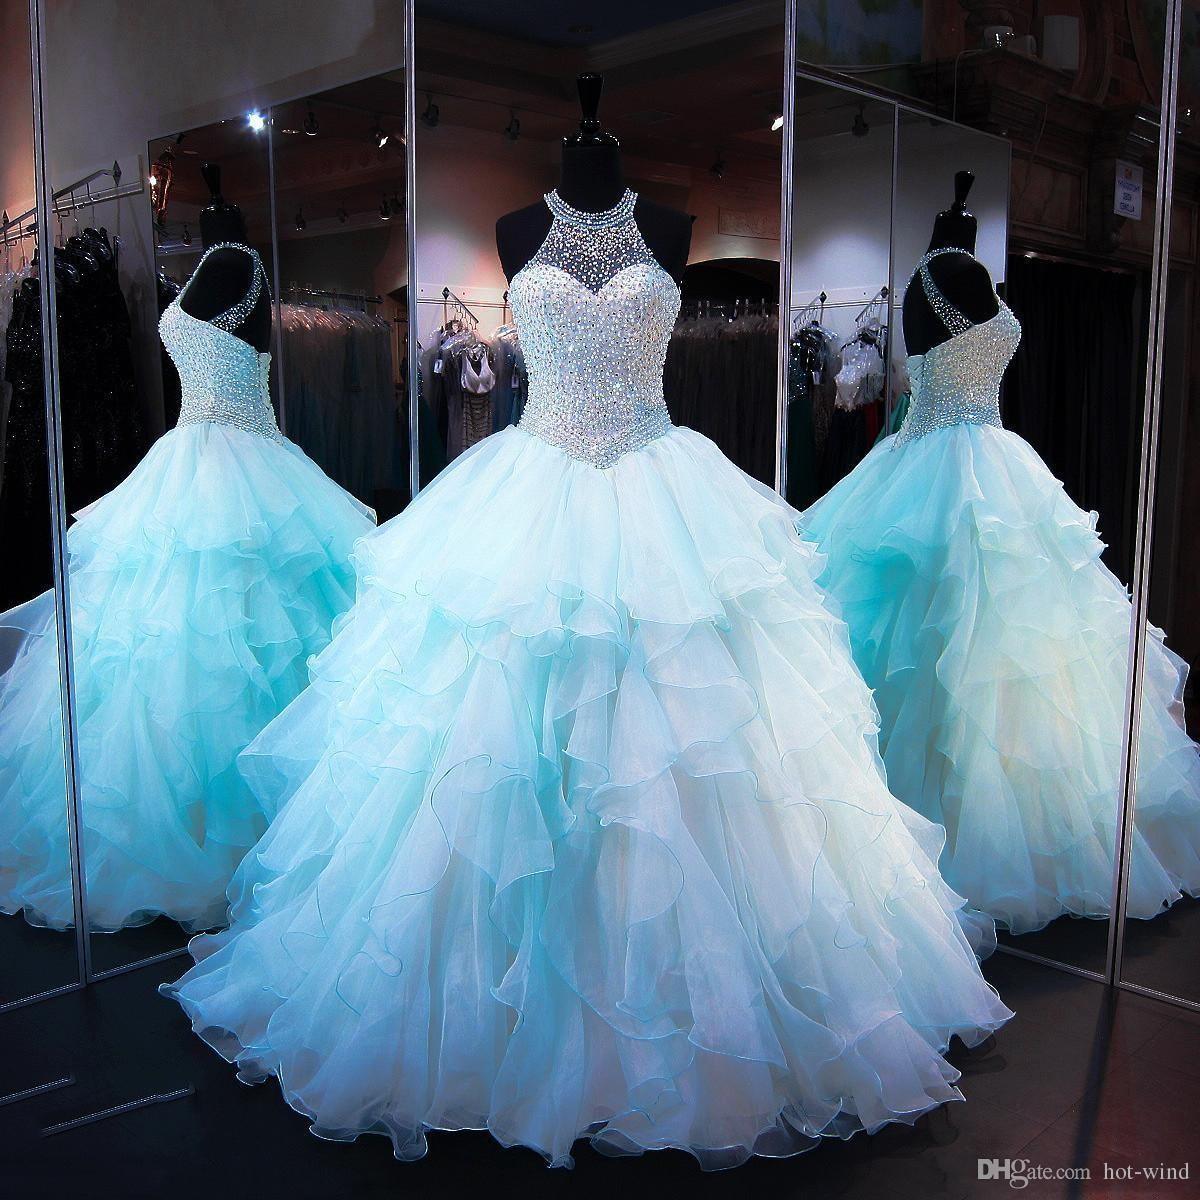 Light Sky Blue Organza Quinceanera Dresses 2020 Keyhole ...  Light Sky Blue ...